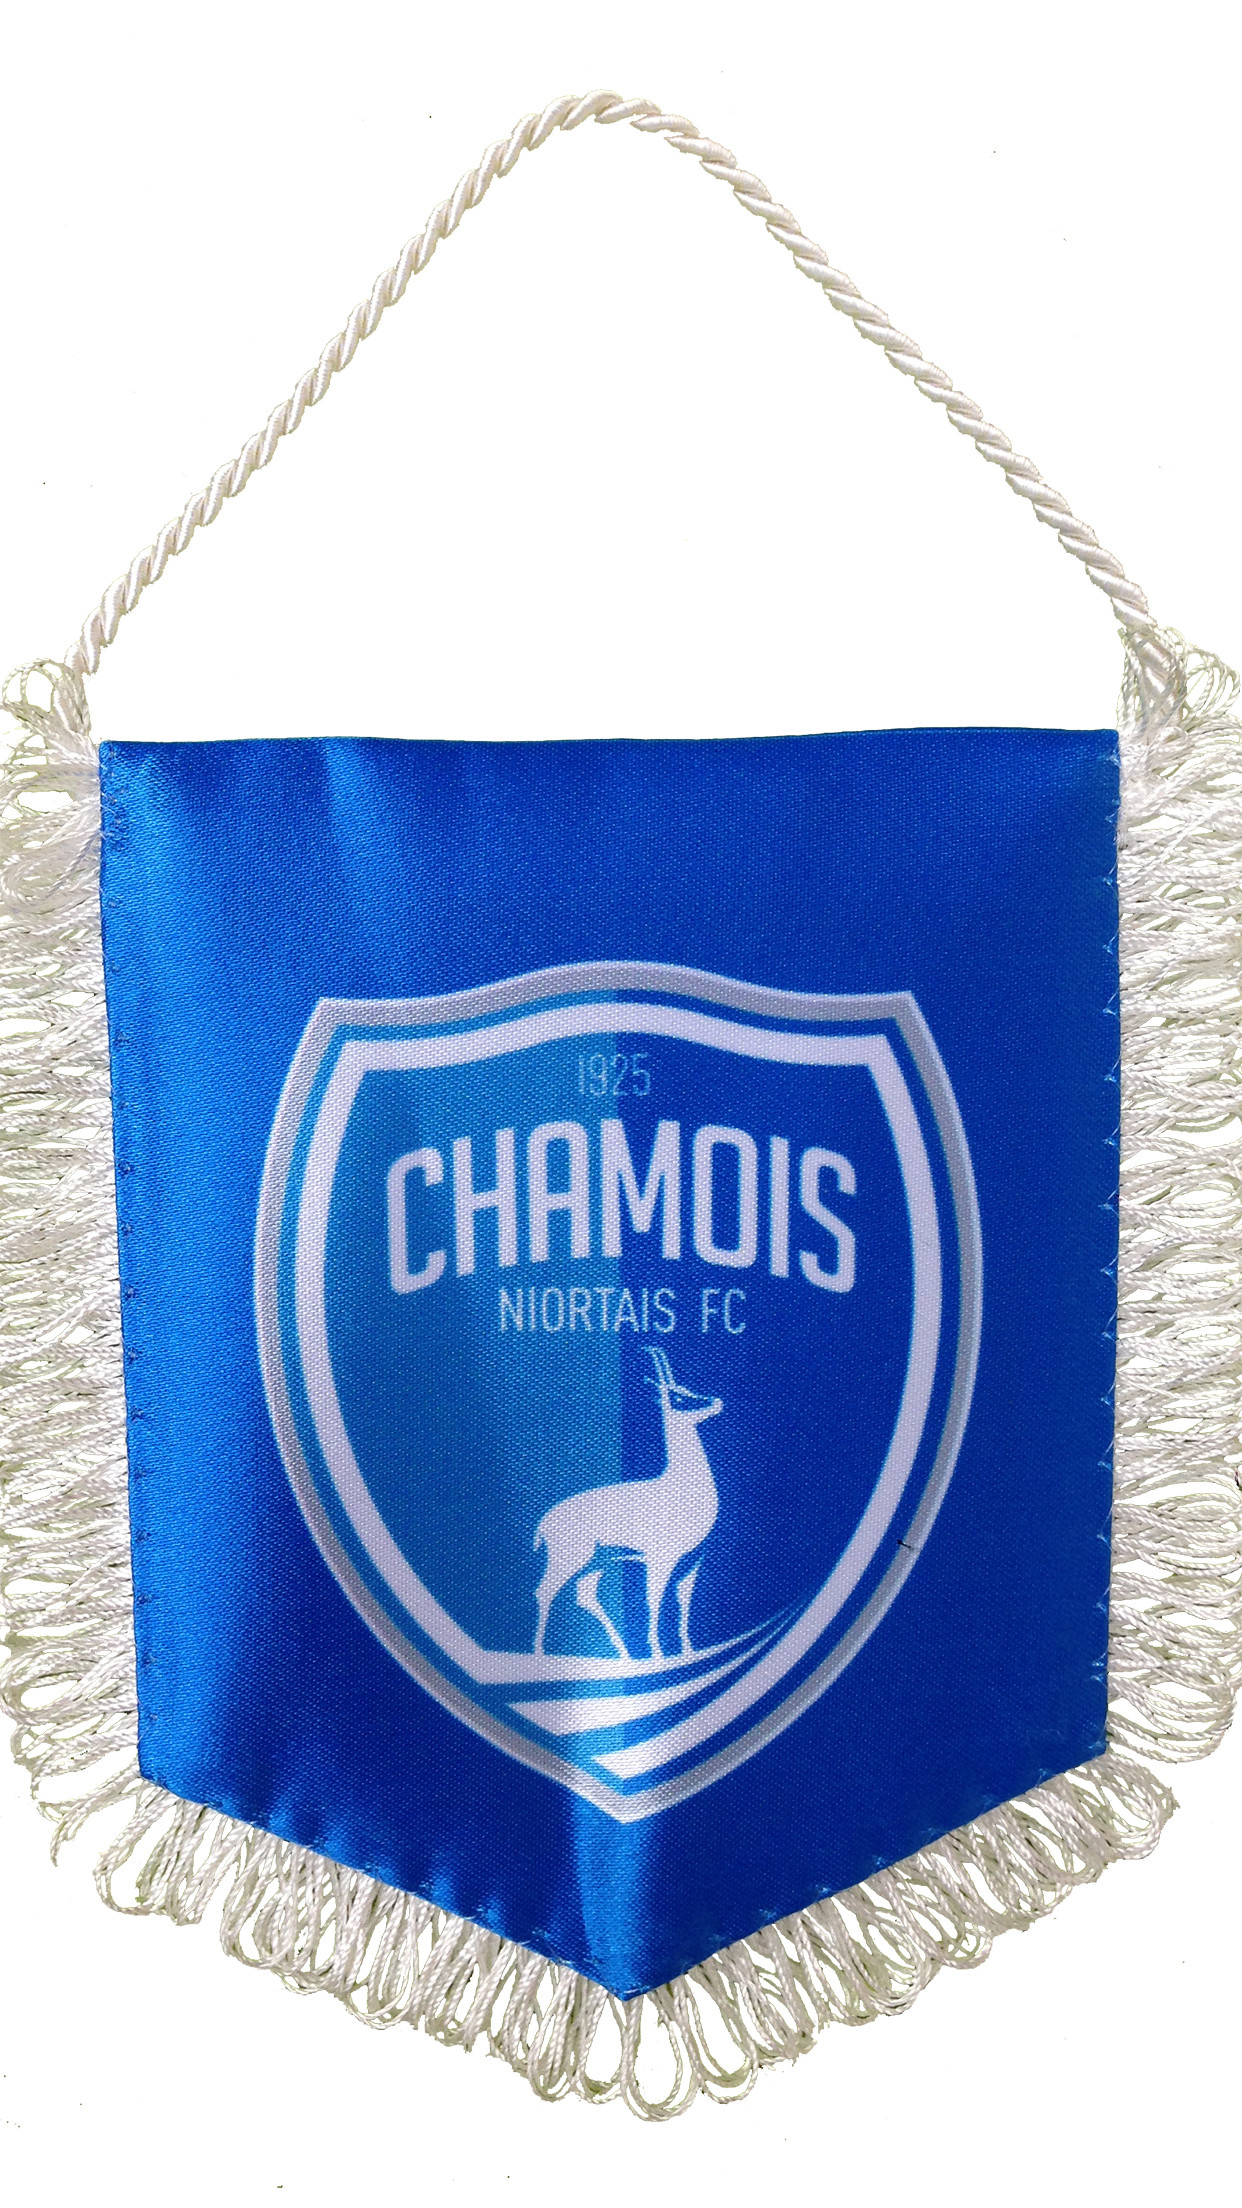 Niort Chamois Fanion 3Wallpapers iPhone Parallax Niort Chamois : Fanion